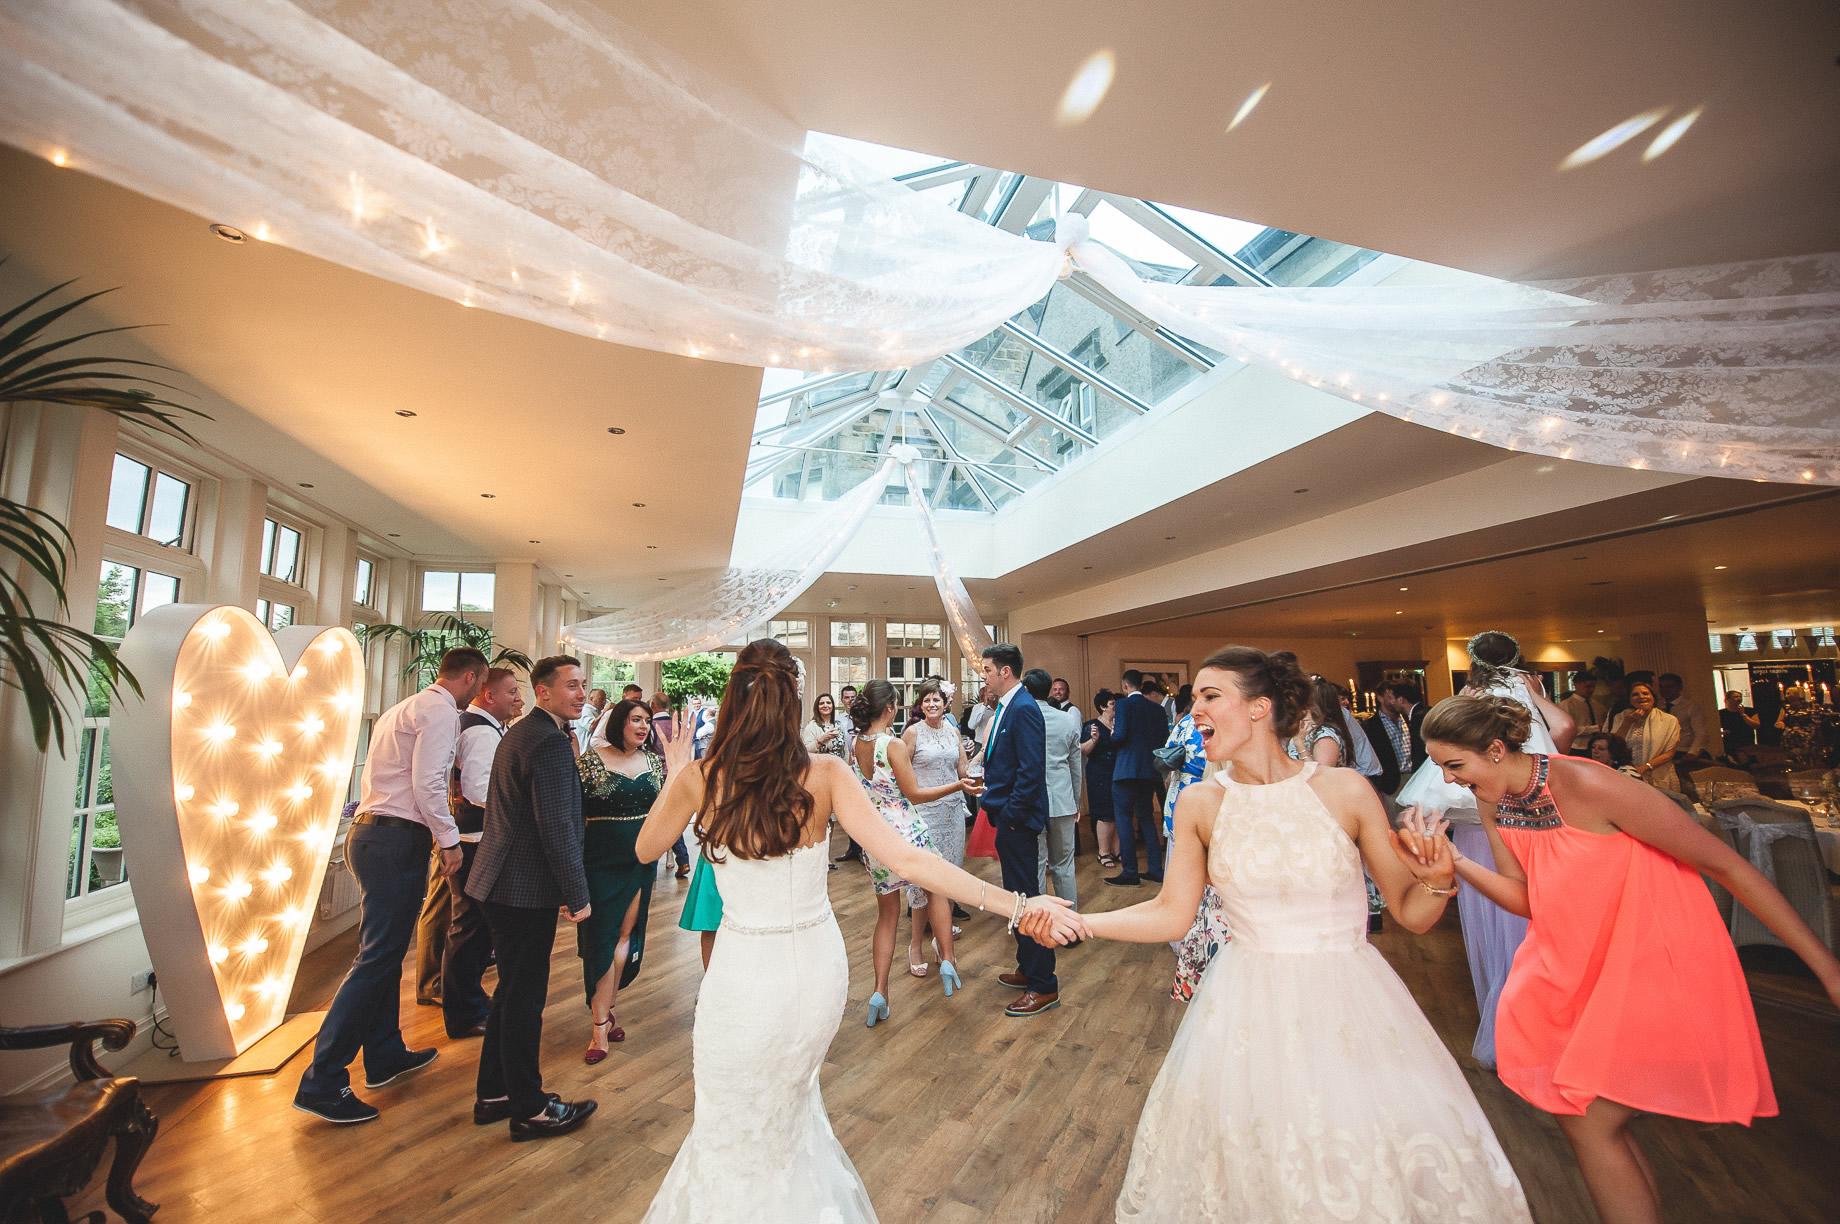 Helen and Matt's Wedding at Mitton Hall 134